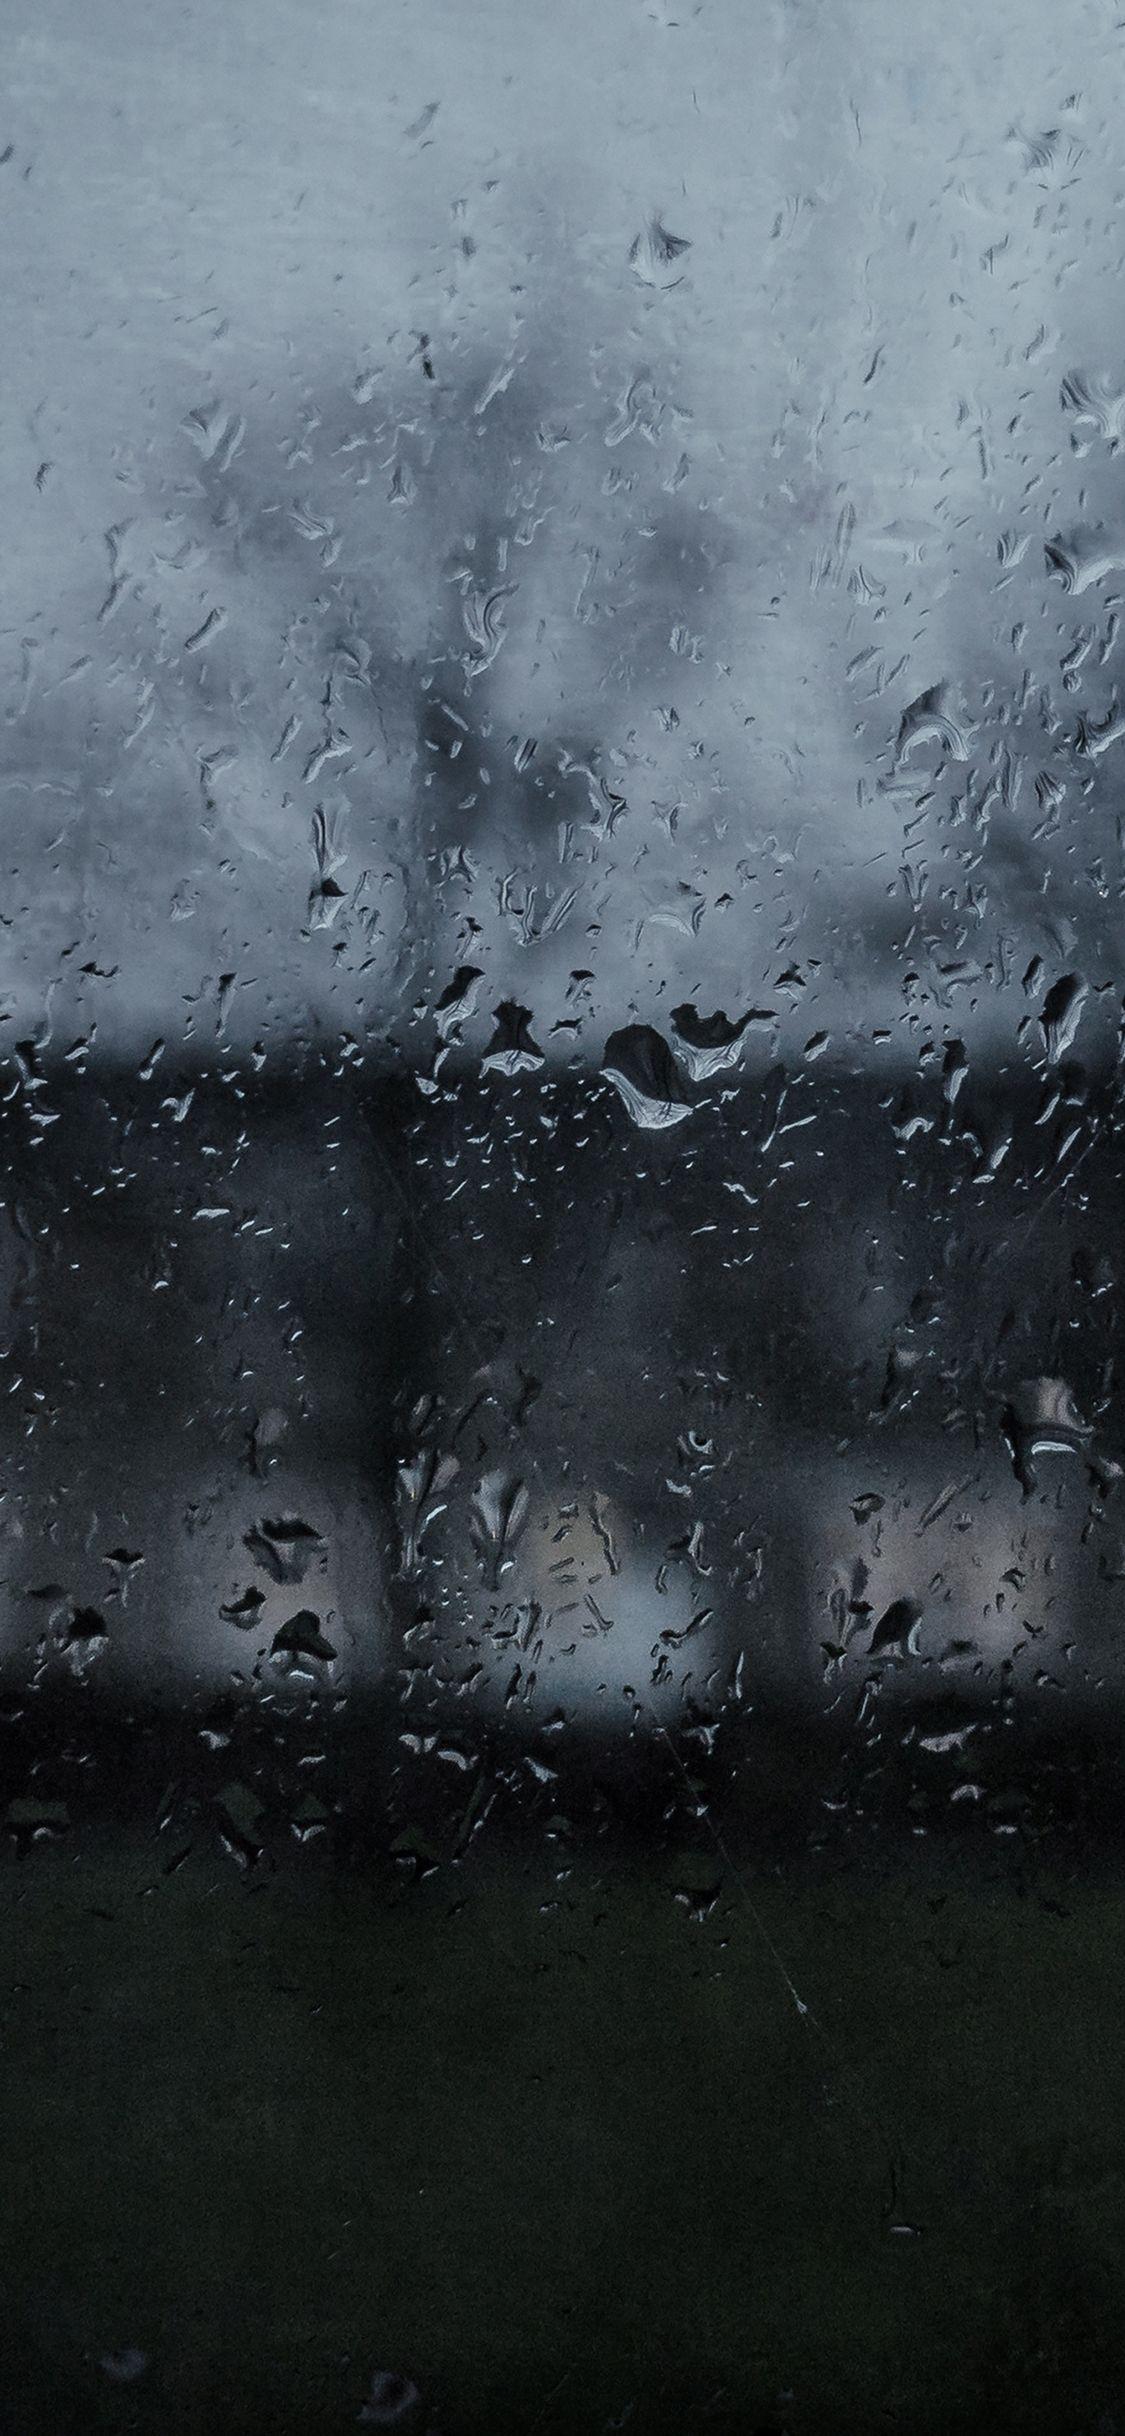 Iphonex Wallpaper Mi63 Good To Stay Home Dark Rainy Window